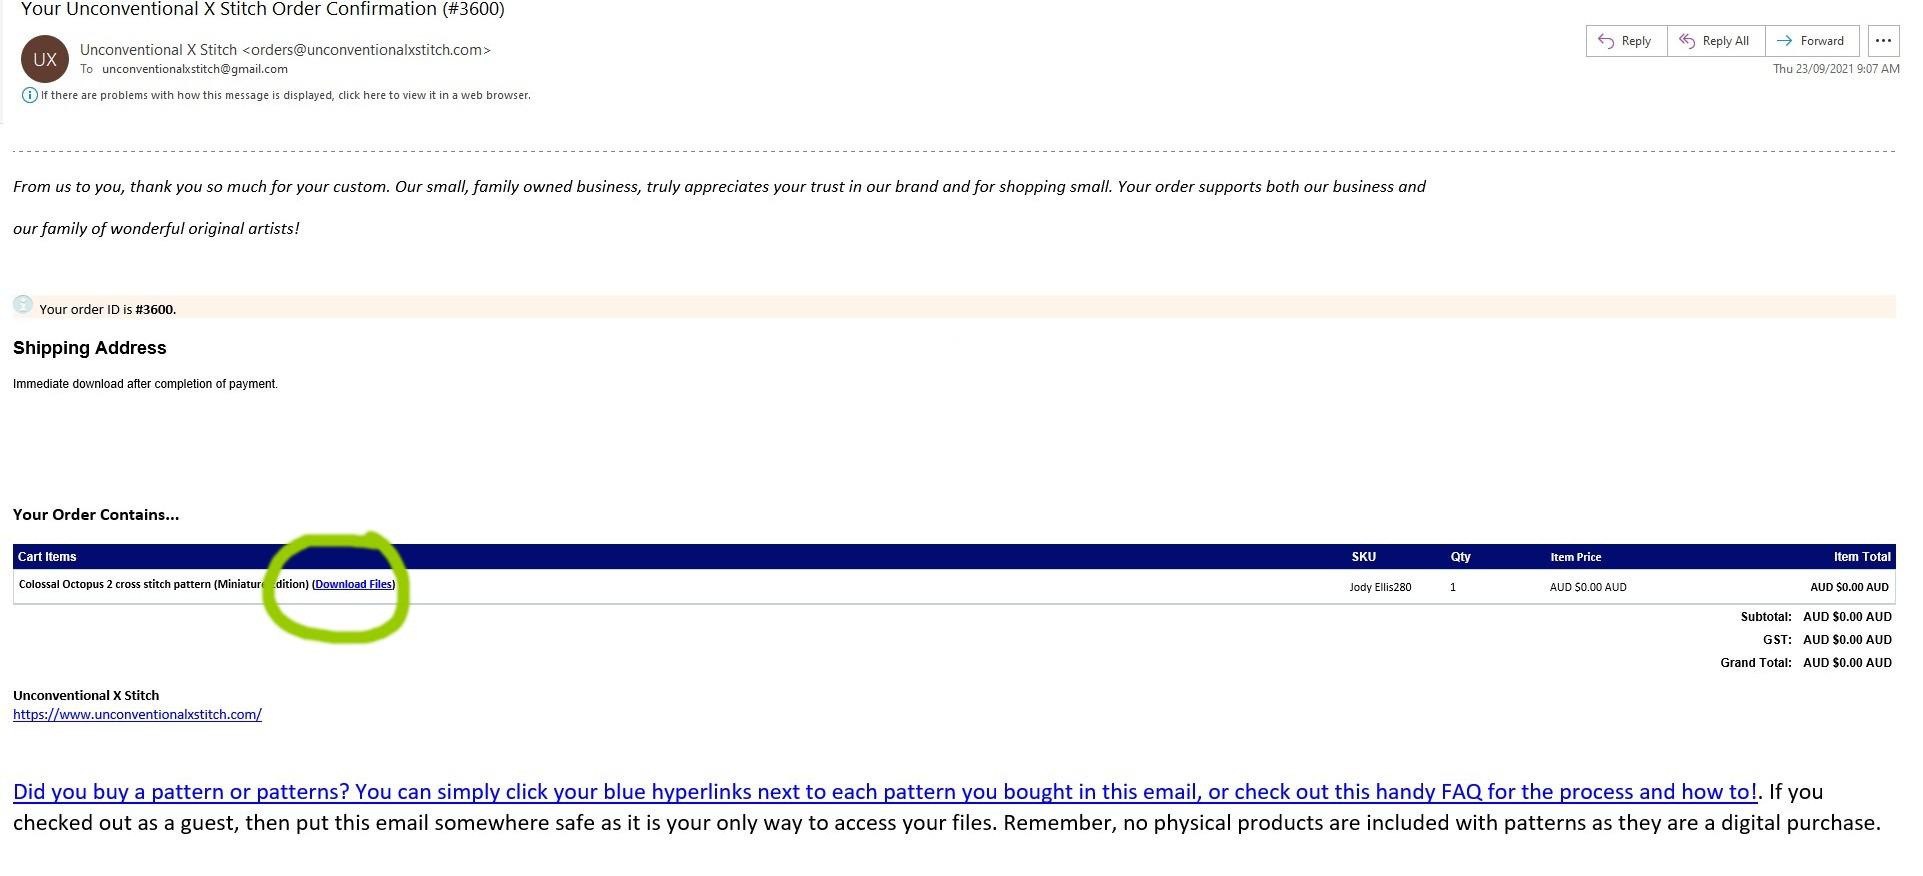 order-confirmation-invoice.jpg